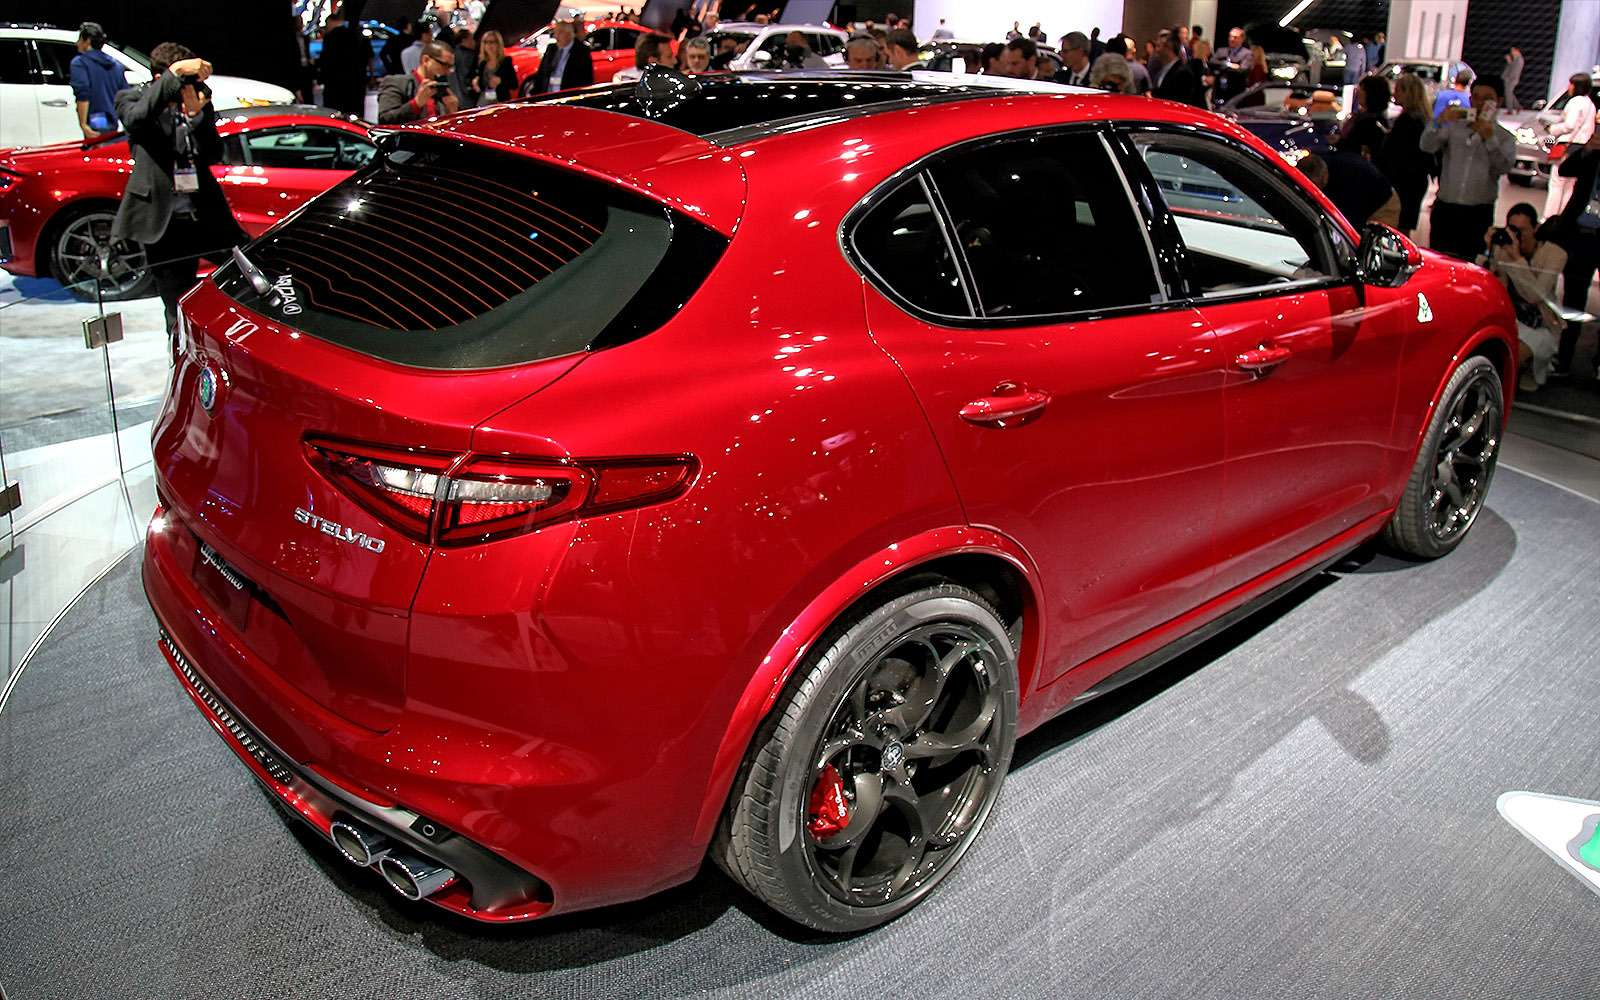 Сила духа: встречайте кроссовер Alfa Romeo Stelvio!— фото 665103